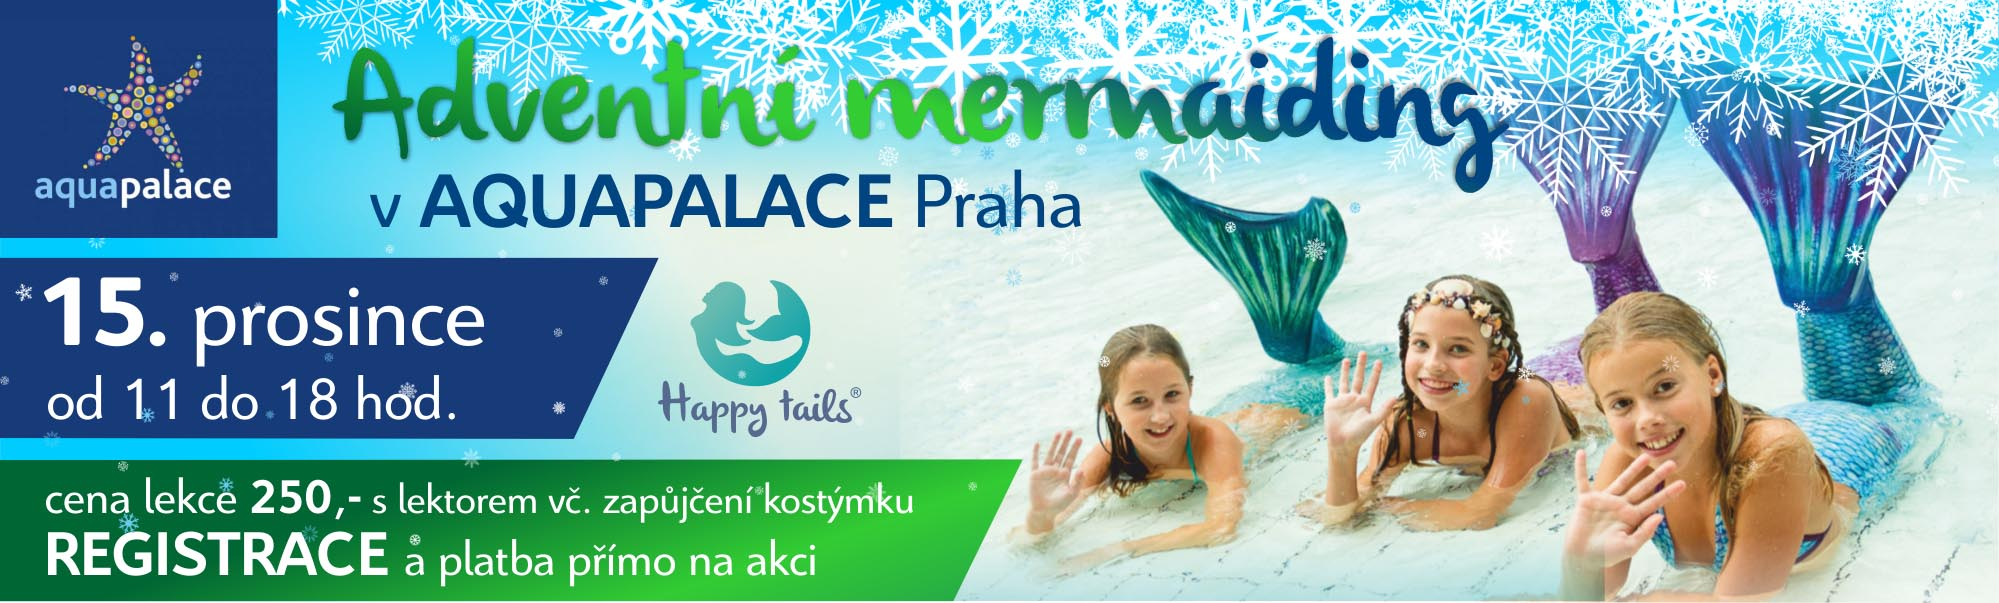 mermaiding_aquapalace